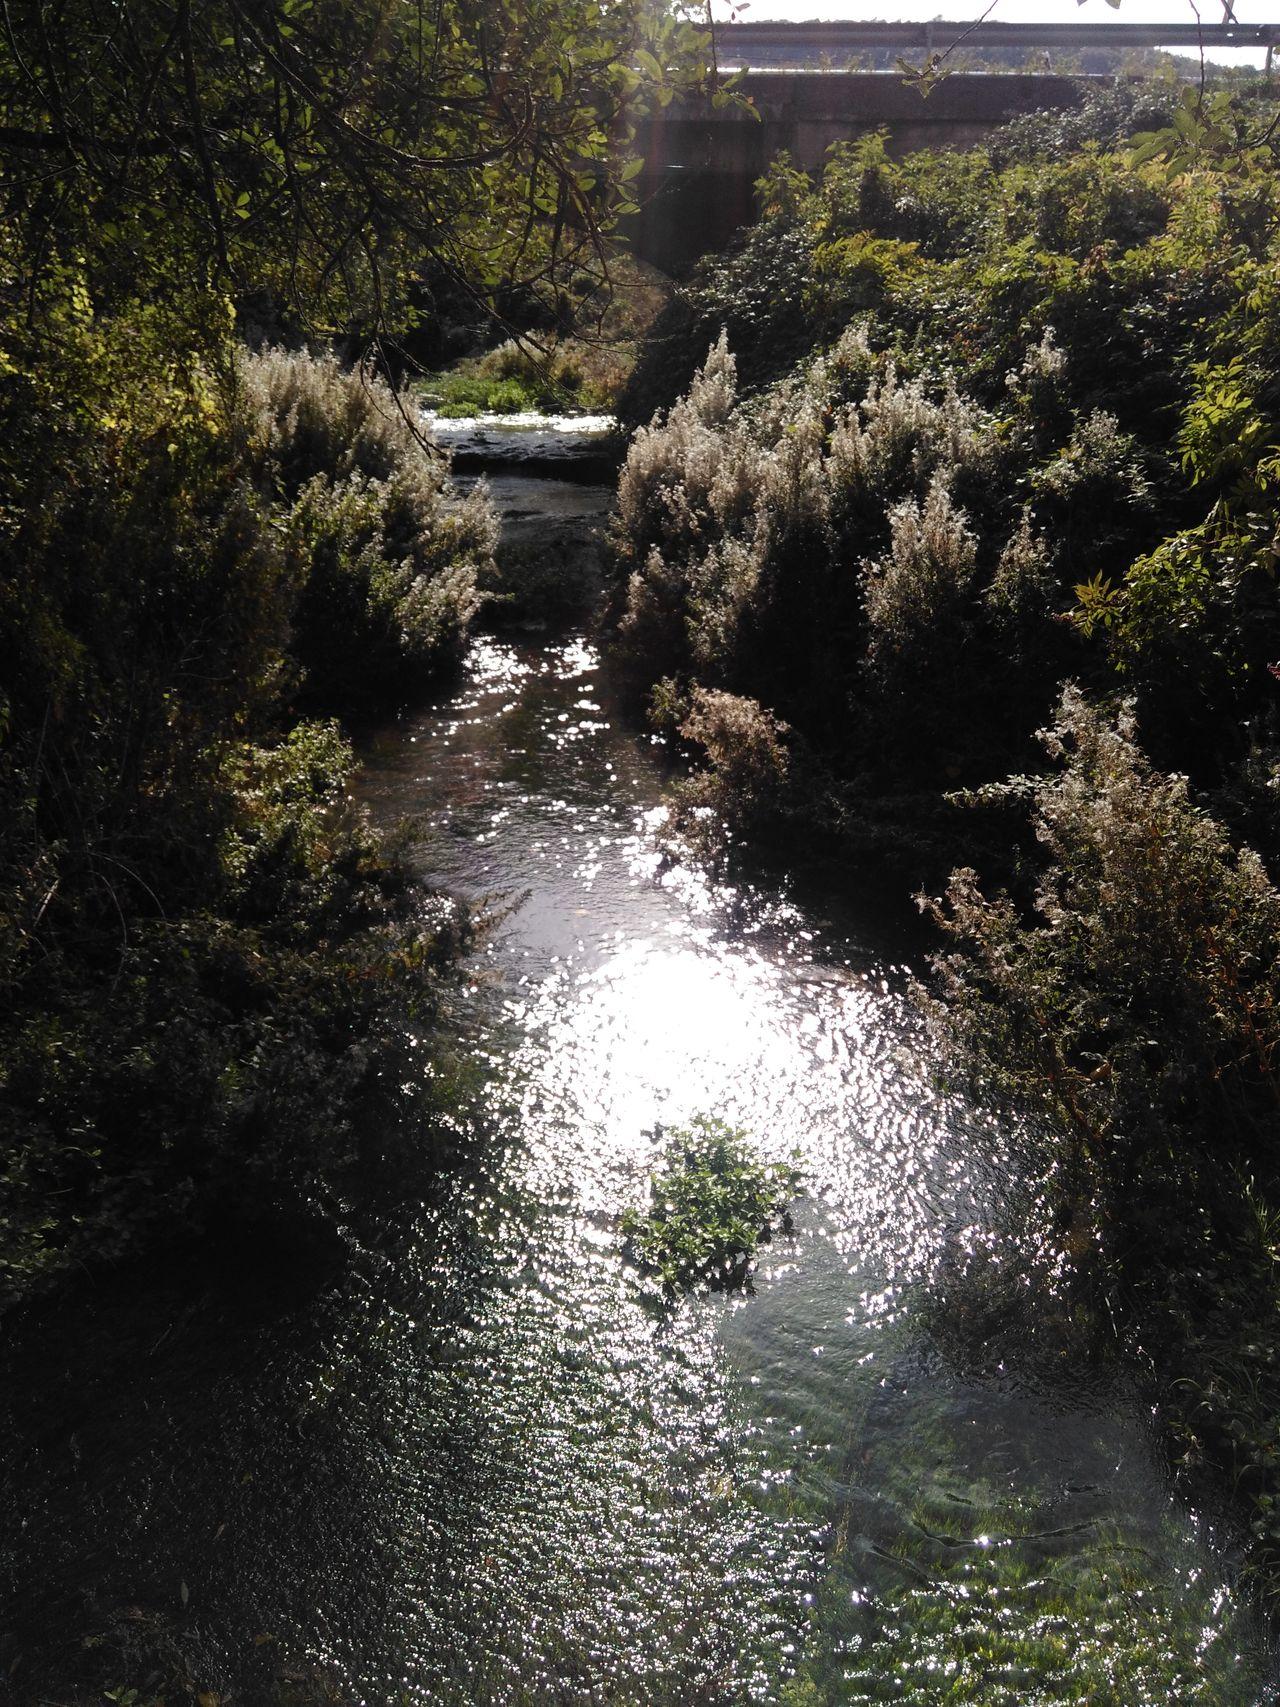 Sunlight Stream Brook BACH Jakobsweg Way Of Saint James Camino CaminodeSantiago Camino De Santiago Way Reise Travel Water